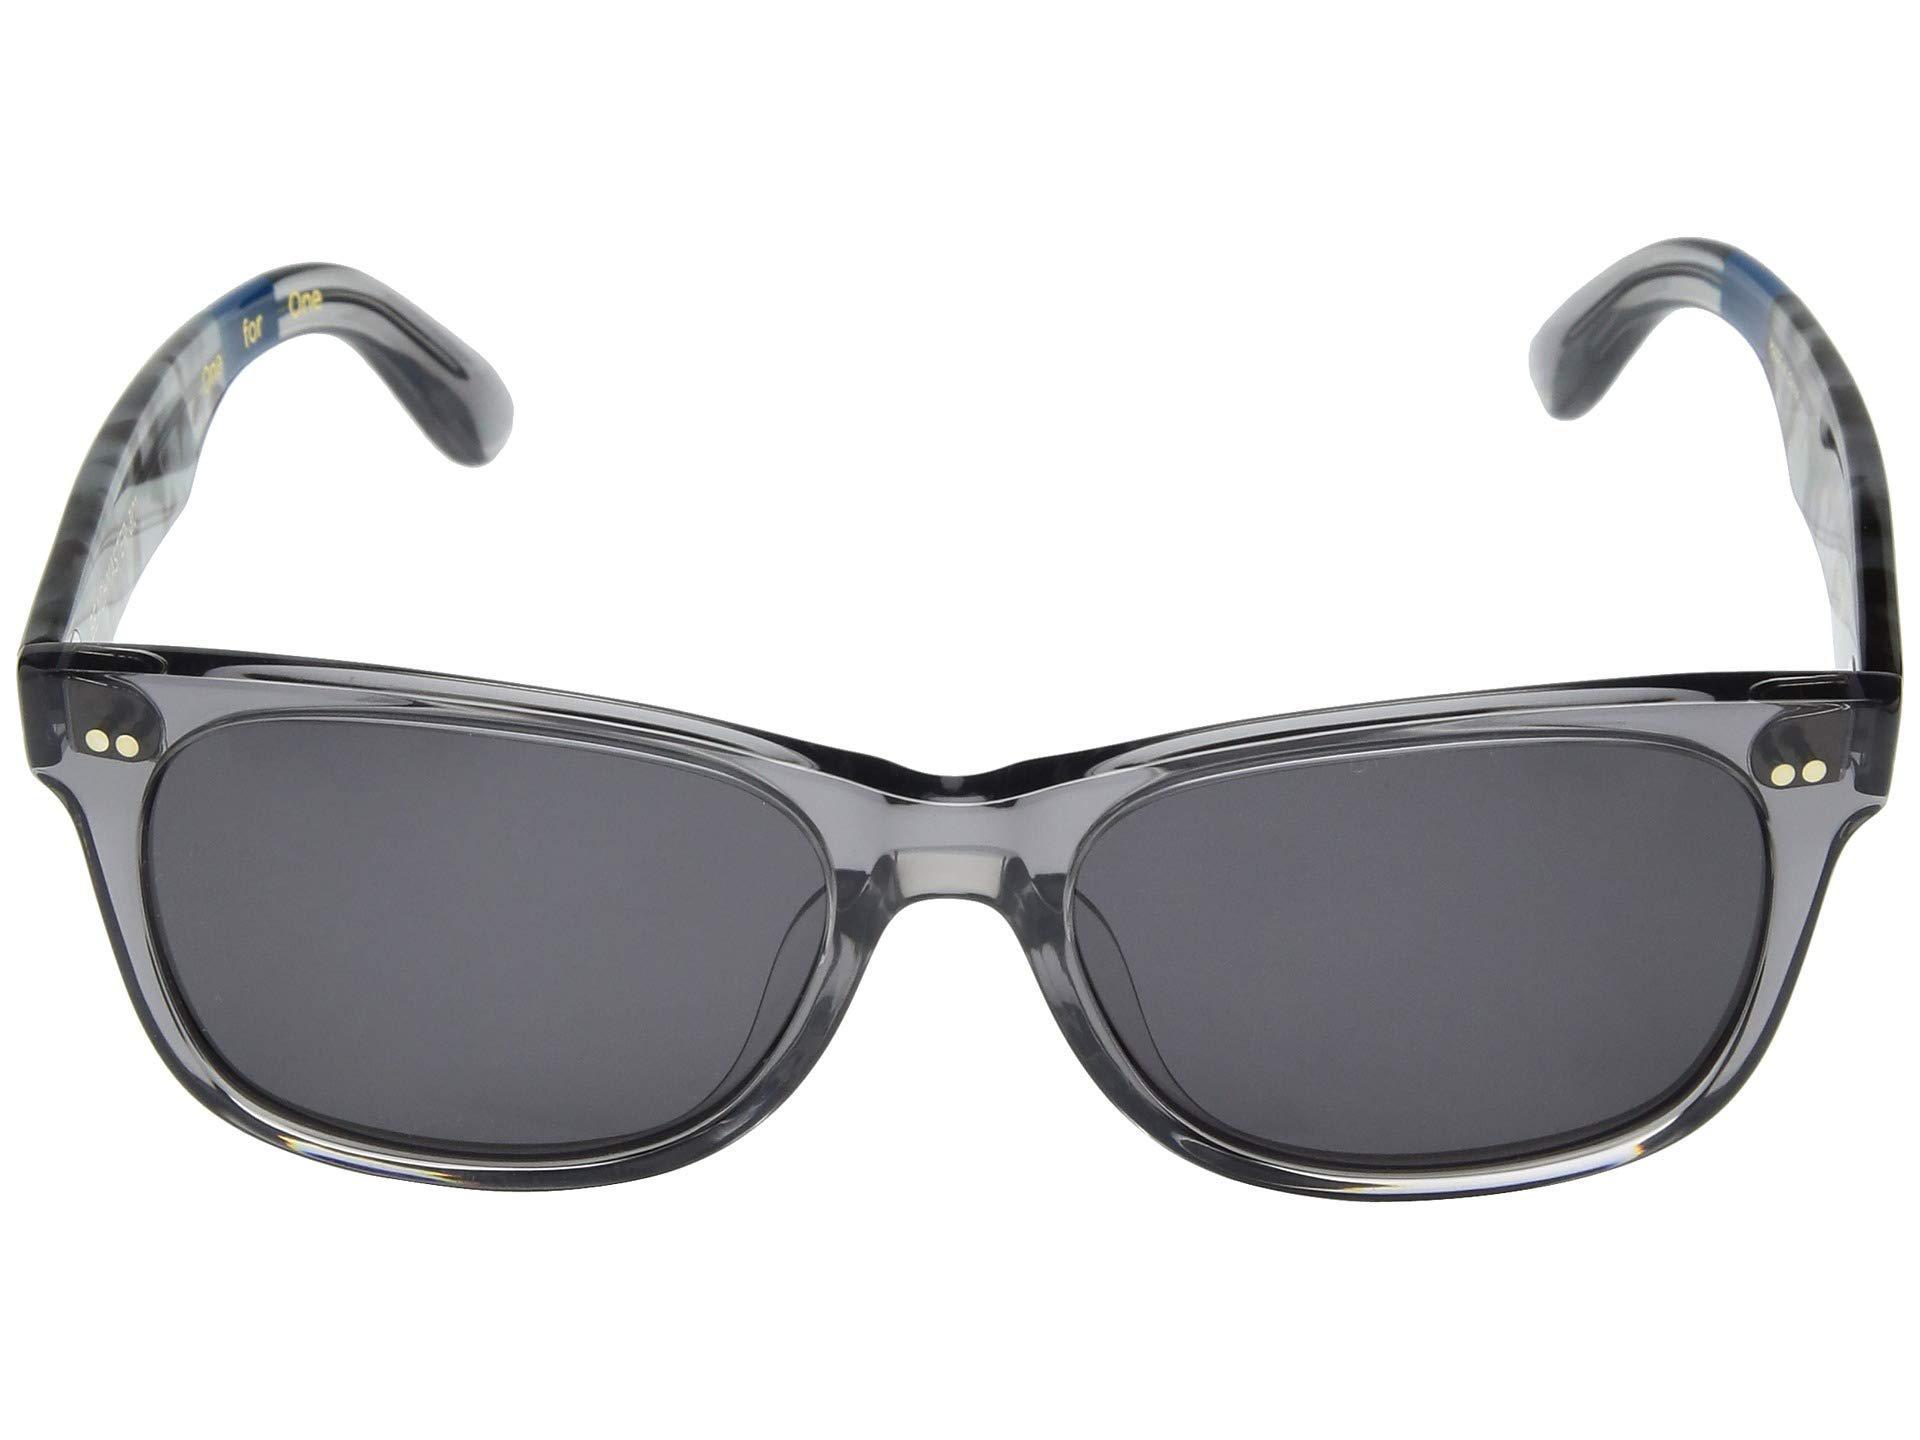 739db66e2c Lyst - TOMS Beachmaster 301 (smoke Grey Crystal) Fashion Sunglasses ...